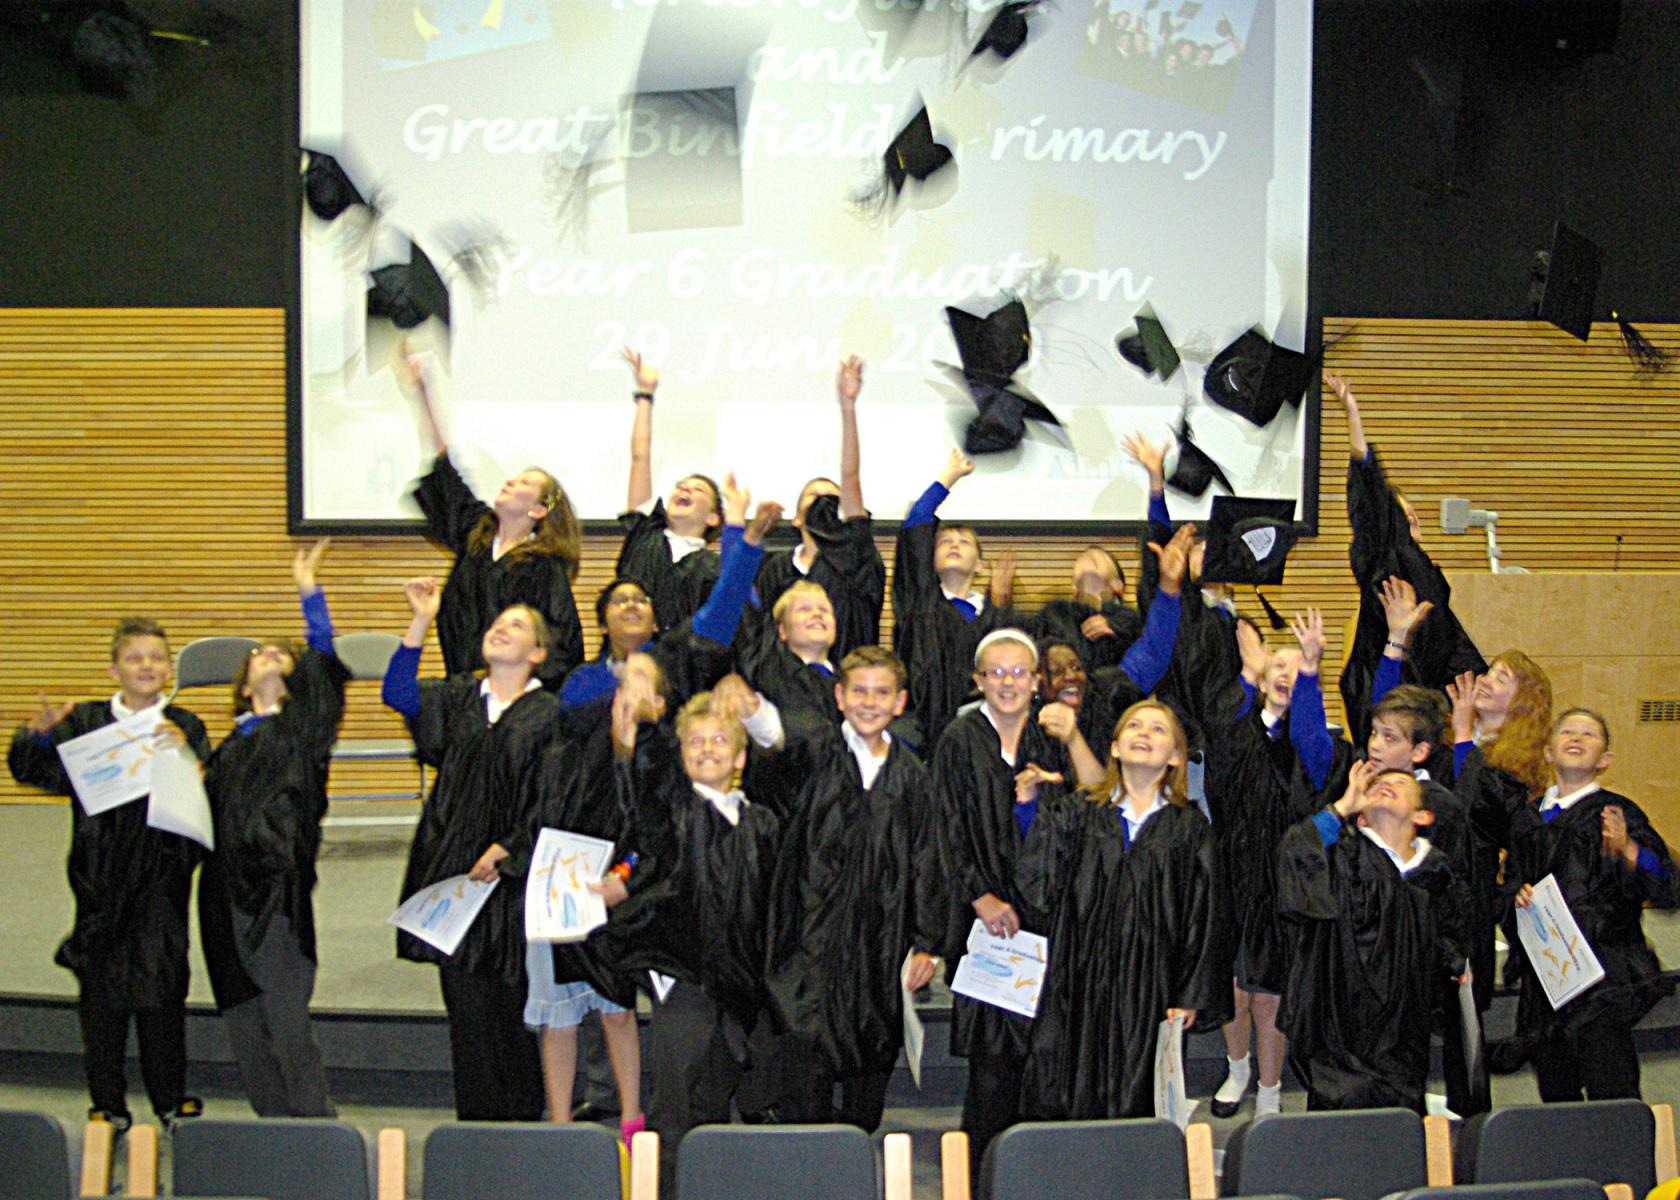 Primary-School-Graduation-Sandra-Sergeant-Schools-Nursery-Photographer-Basingstoke